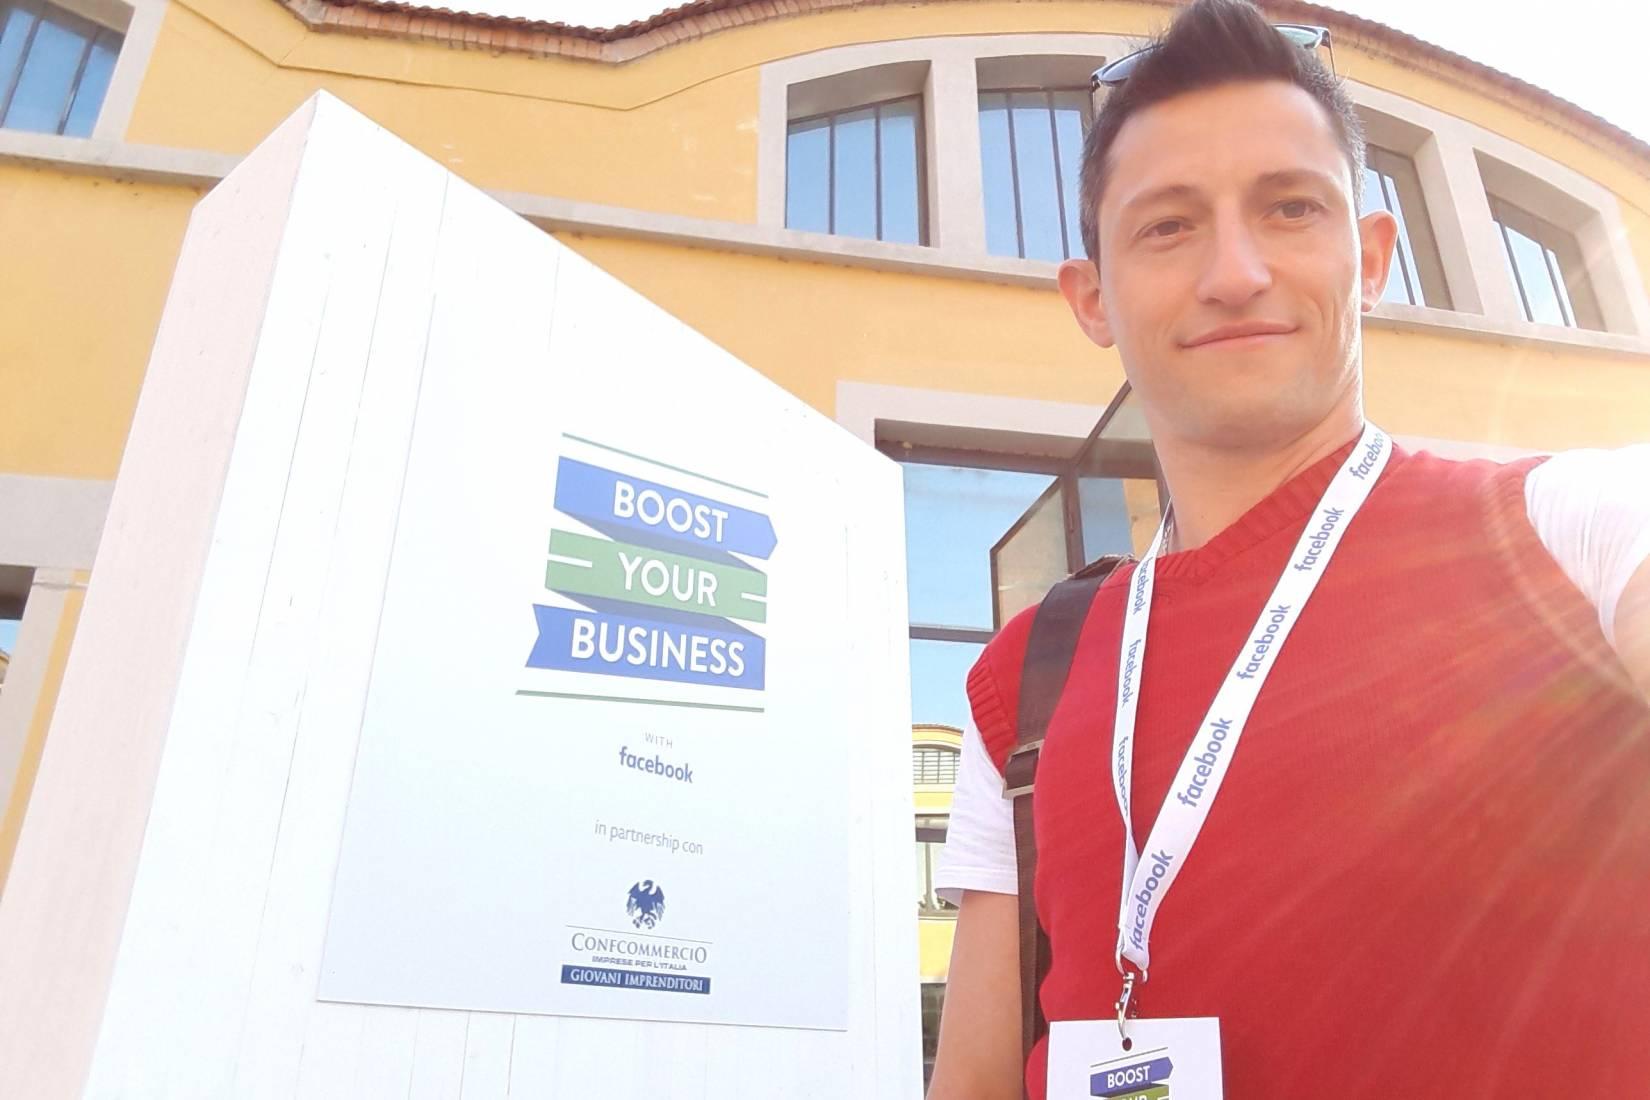 Facebook incontra le aziende a Perugia